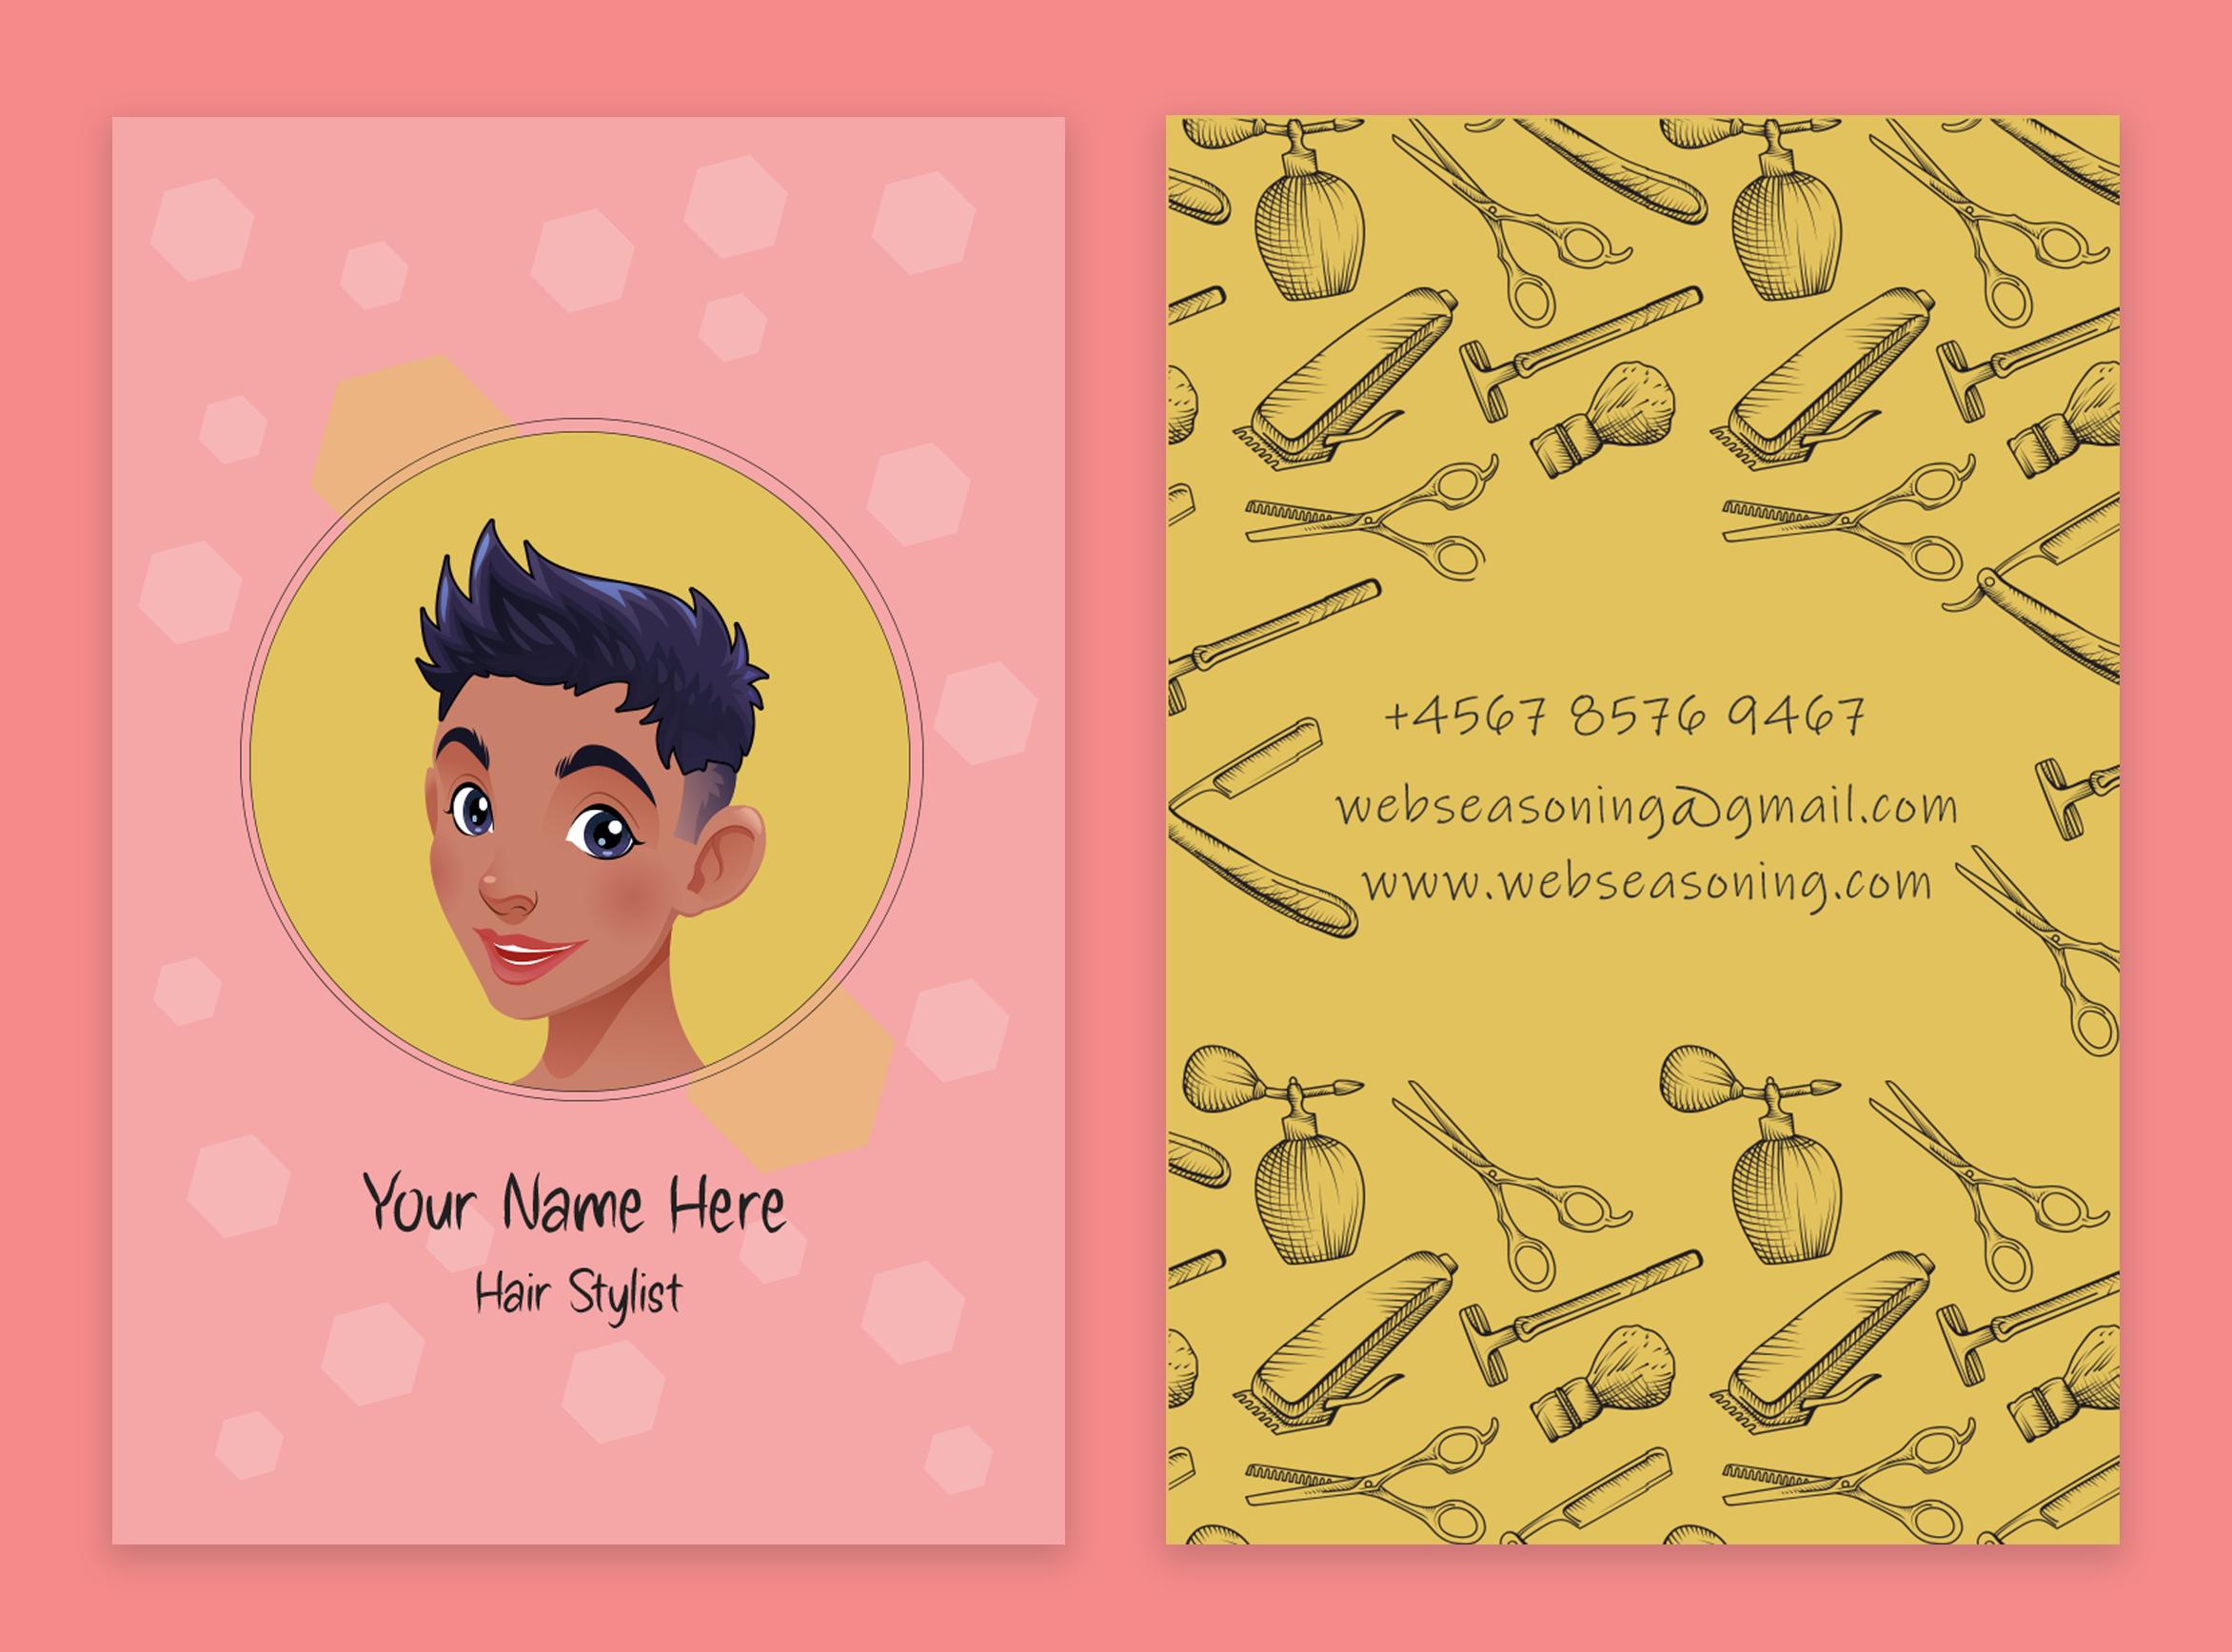 Kawaii style business card template